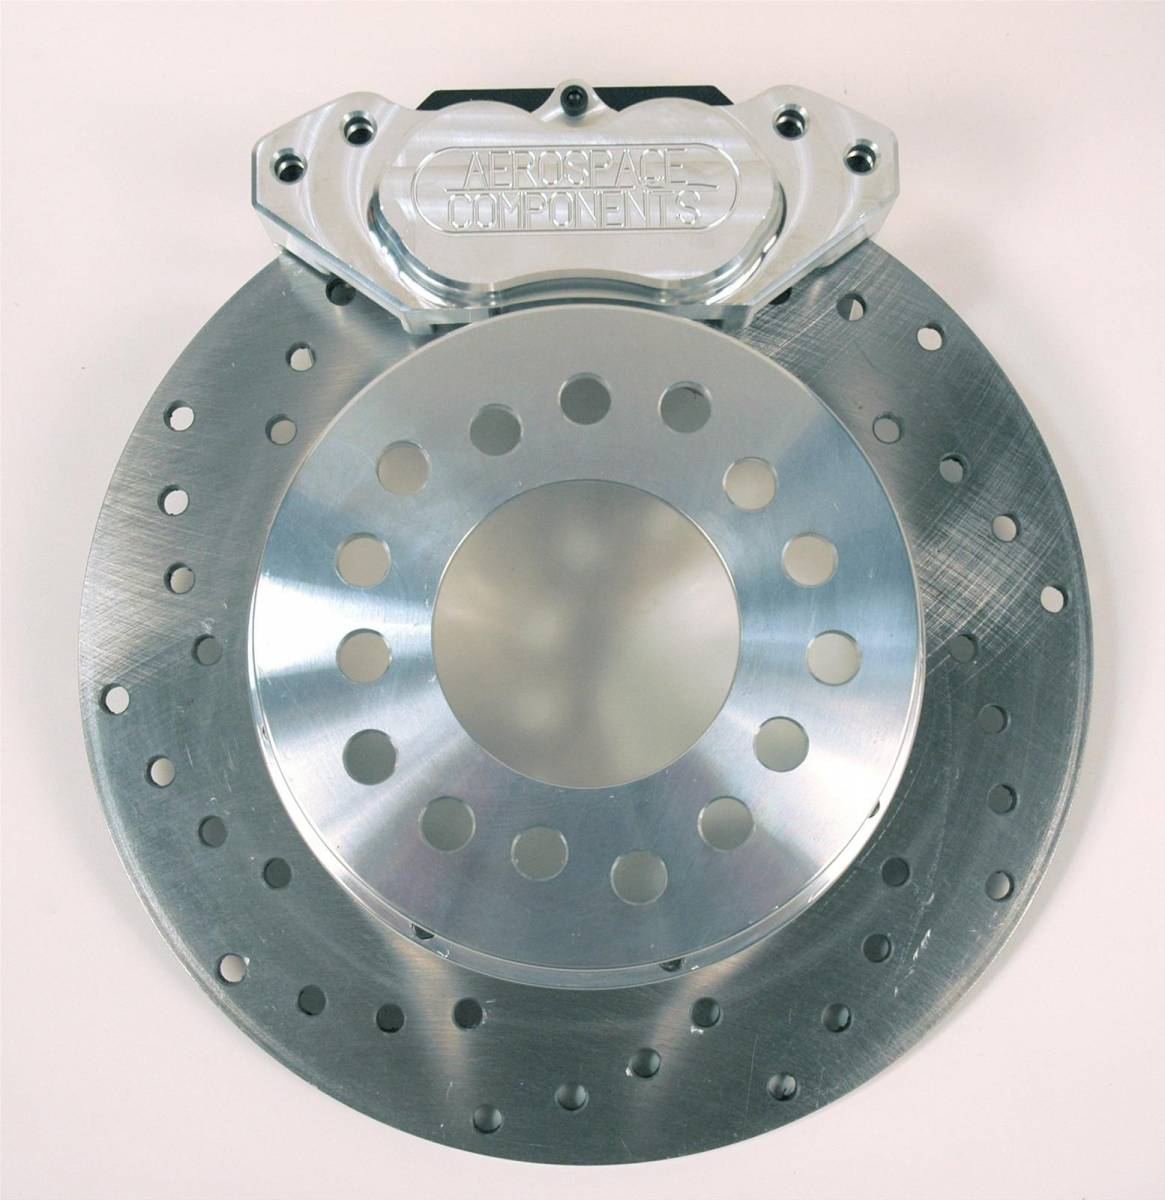 Aerospace Components - Aerospace Ford 8.8 Rear Drag Disc Brakes 4 Lug w/ Stock Axle Dual Caliper - Image 1